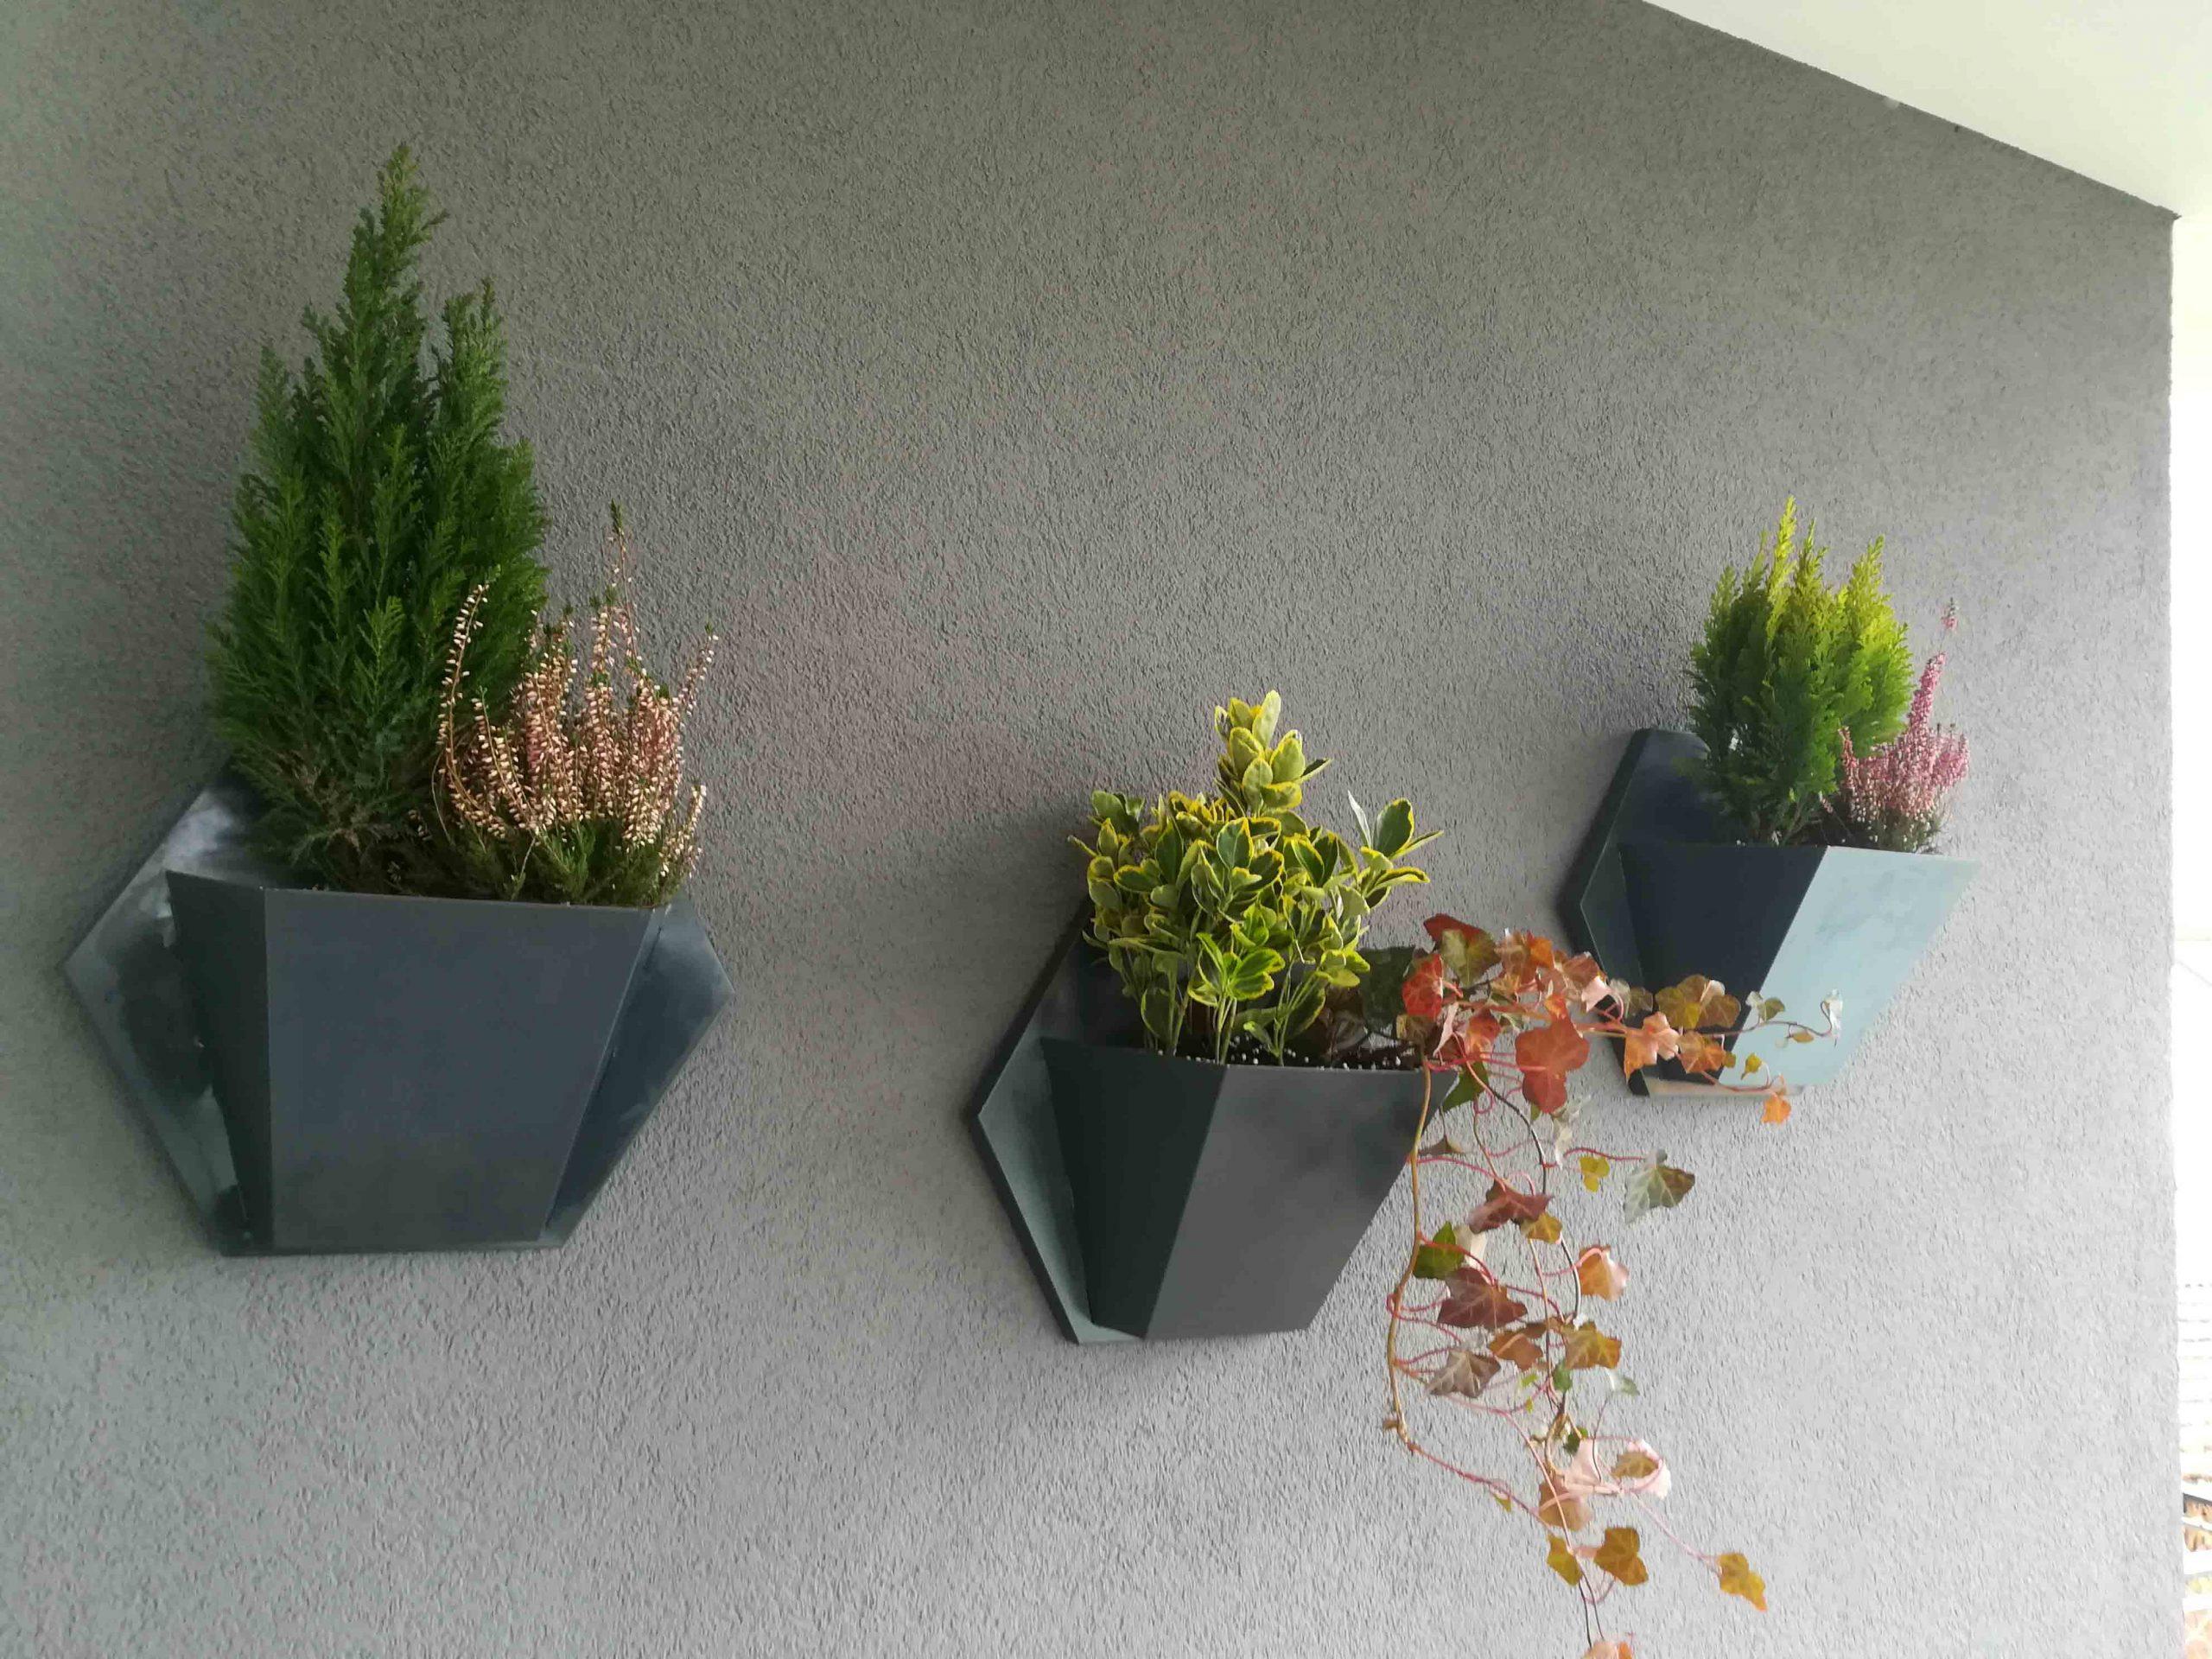 Cvjetni-zidni-moduli-Herbadesign-vanjski-termoizolirani